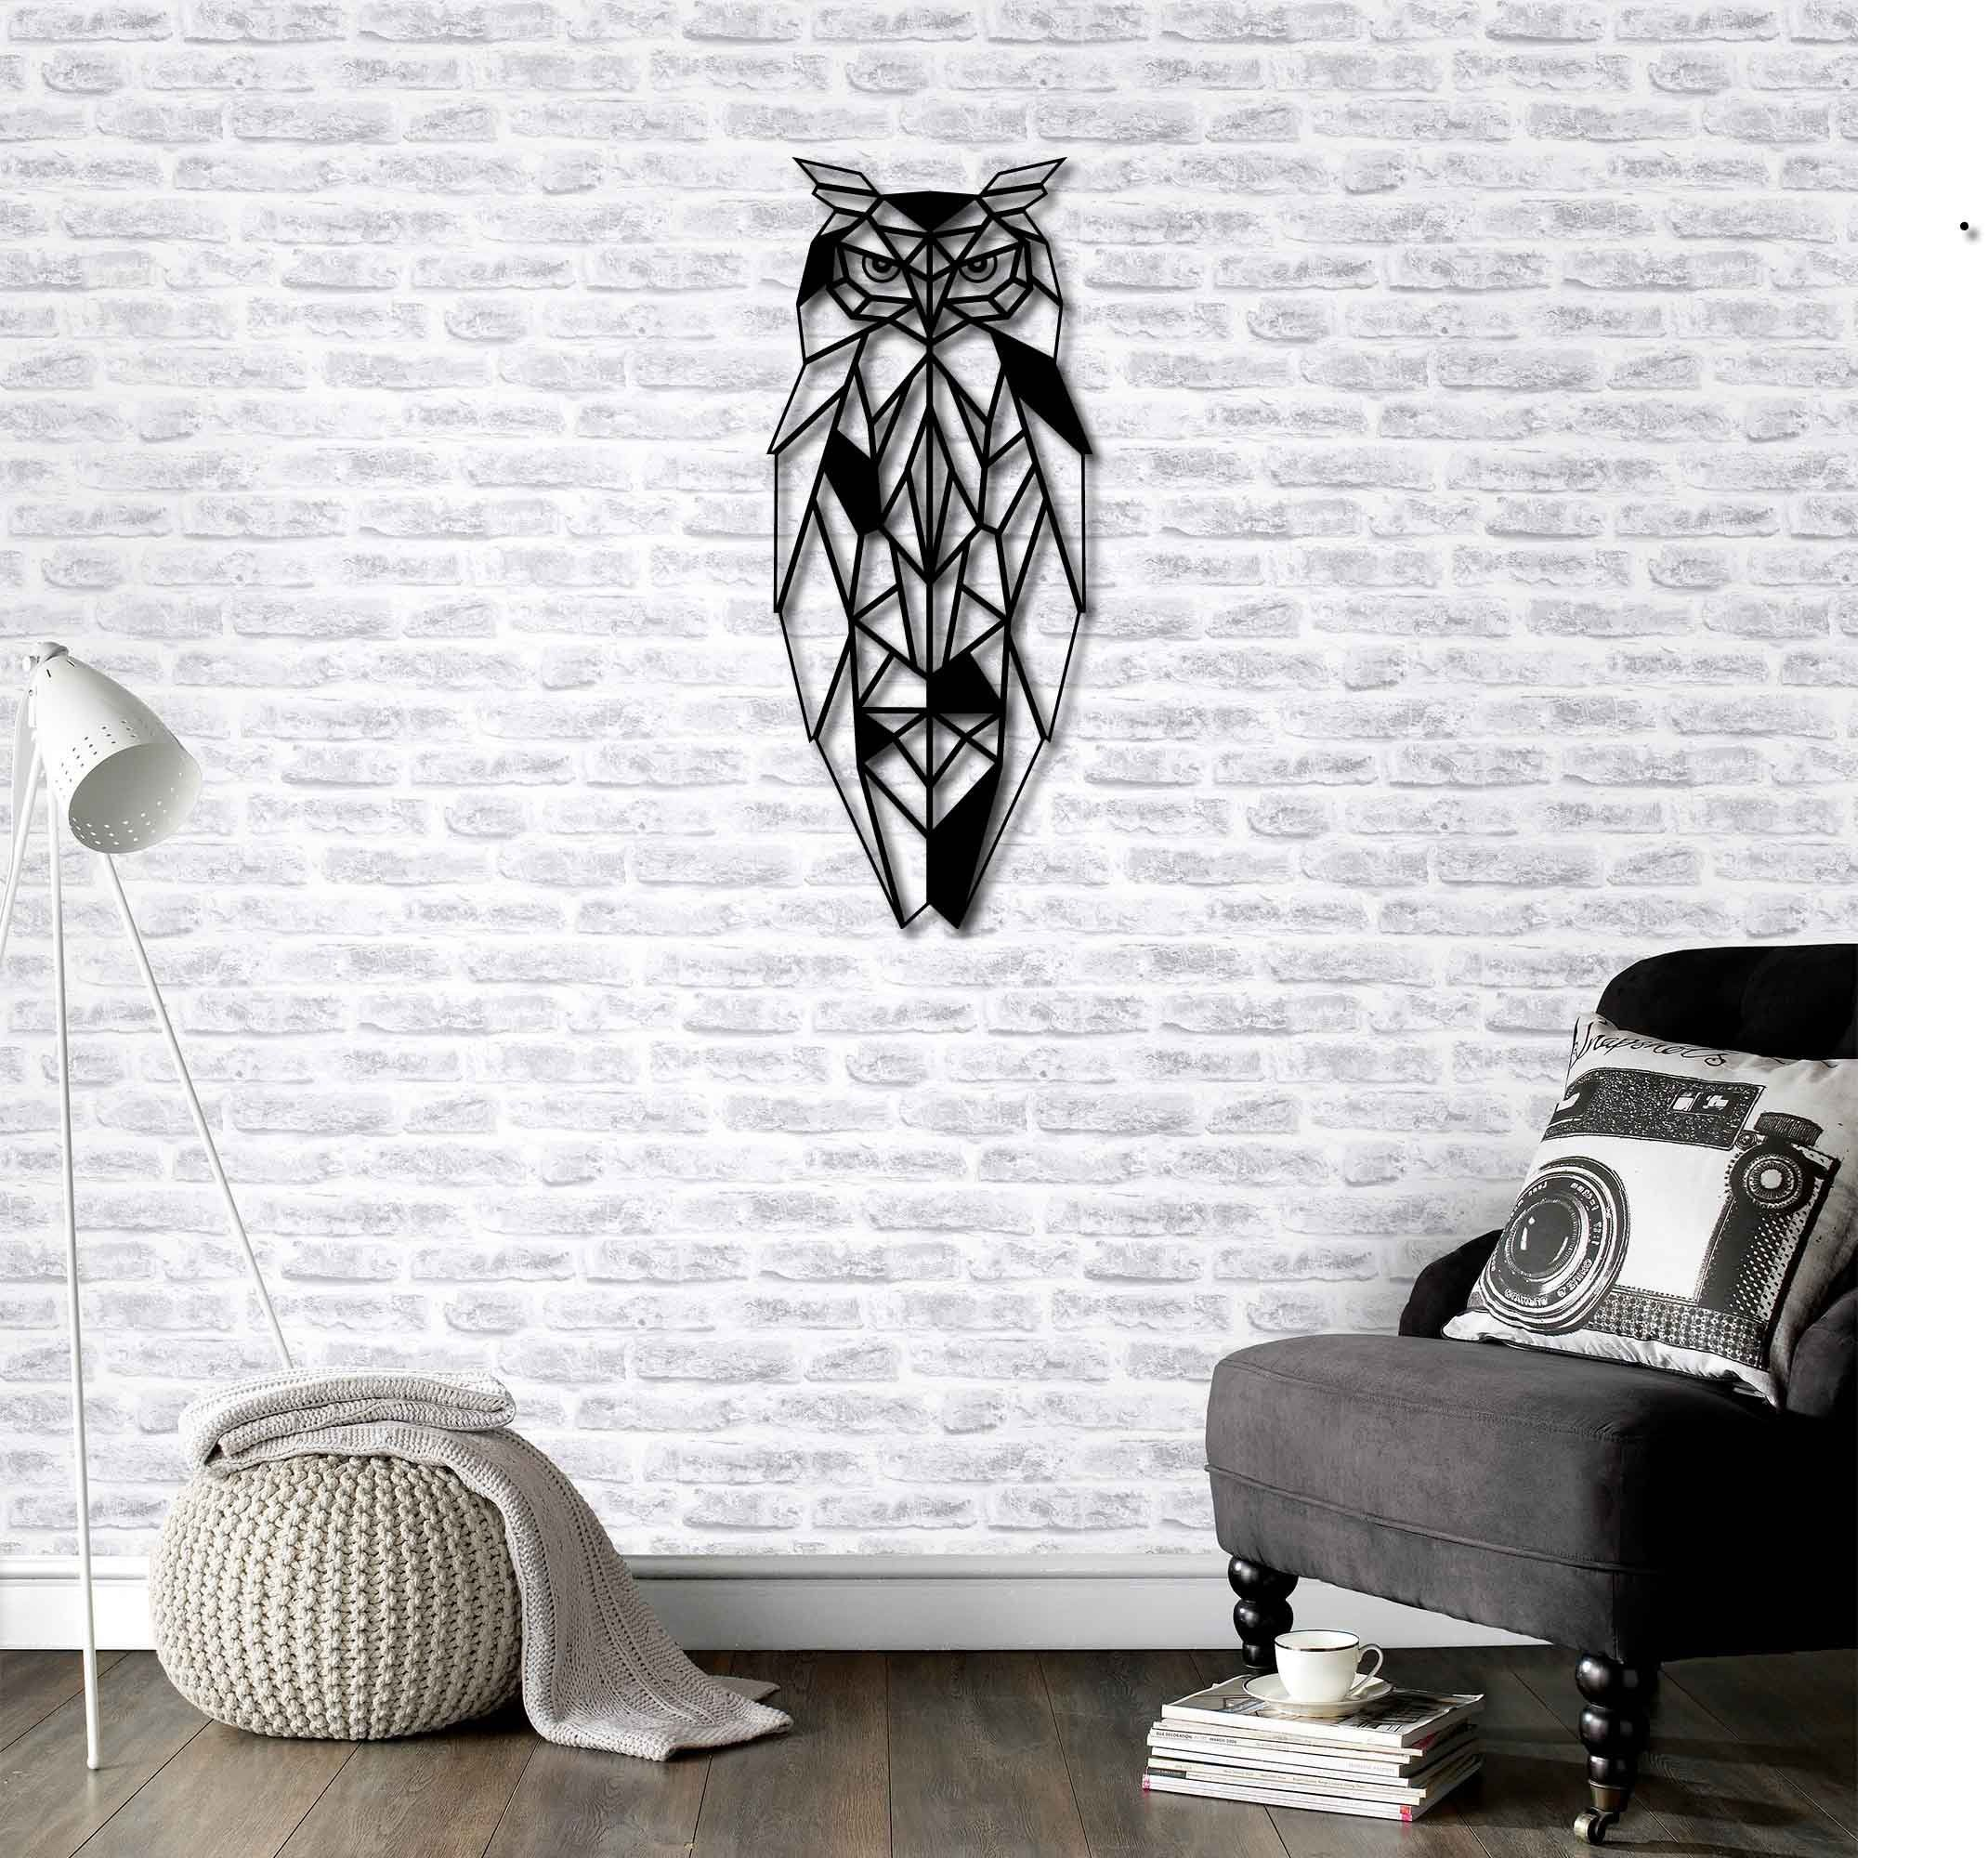 Metal Wall Art Geometric Owl Wall Decor Interior Decoration Etsy In 2020 Owl Wall Decor Wall Decor Design Metal Wall Art Decor